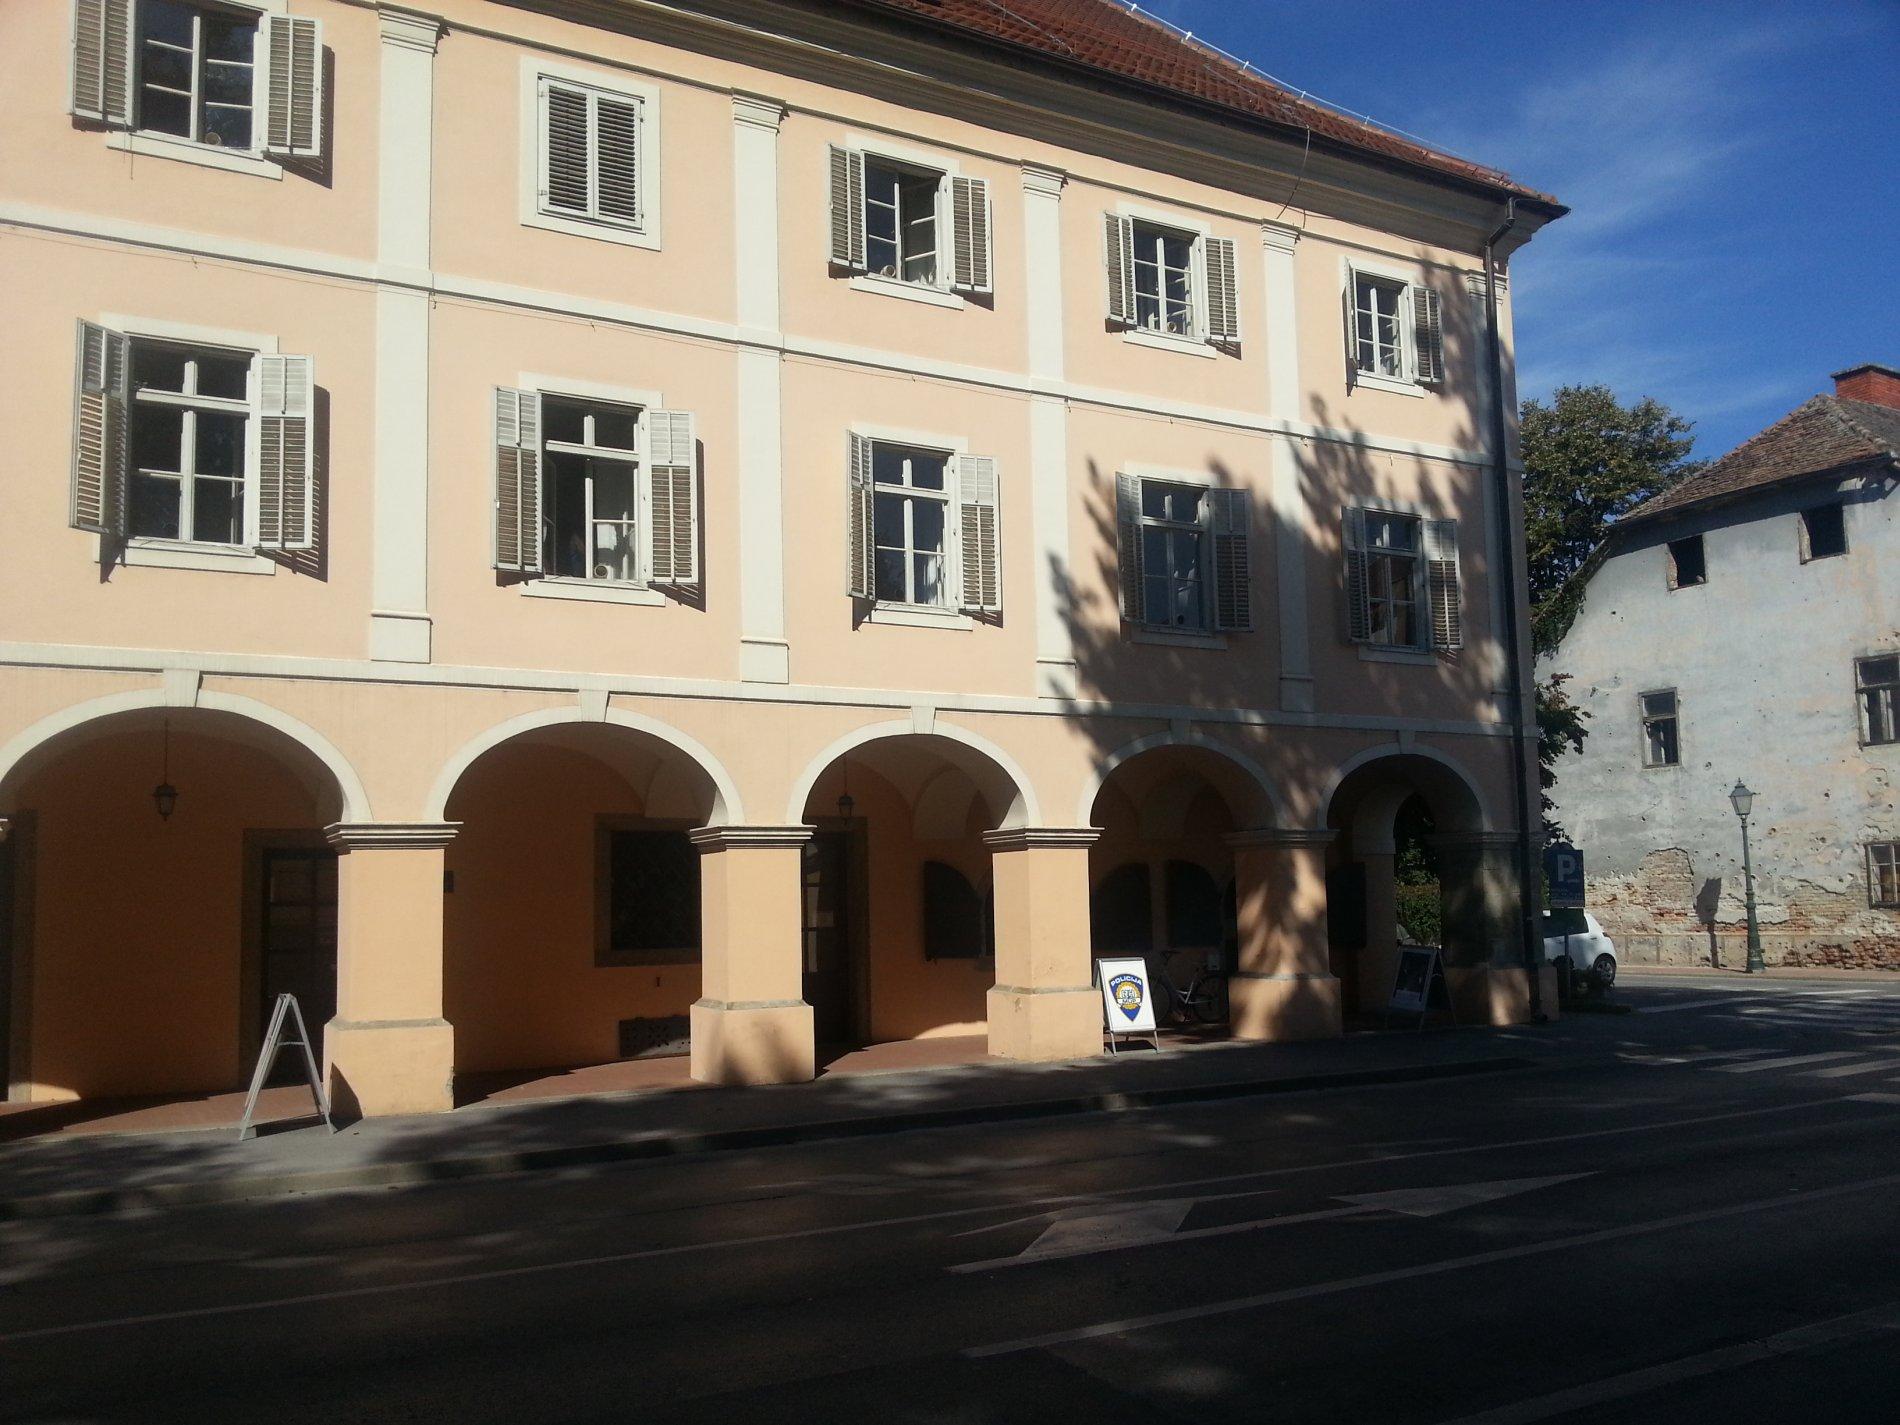 Poslovni prostori Grada Bjelovara - Trg Eugena Kvaternika 2